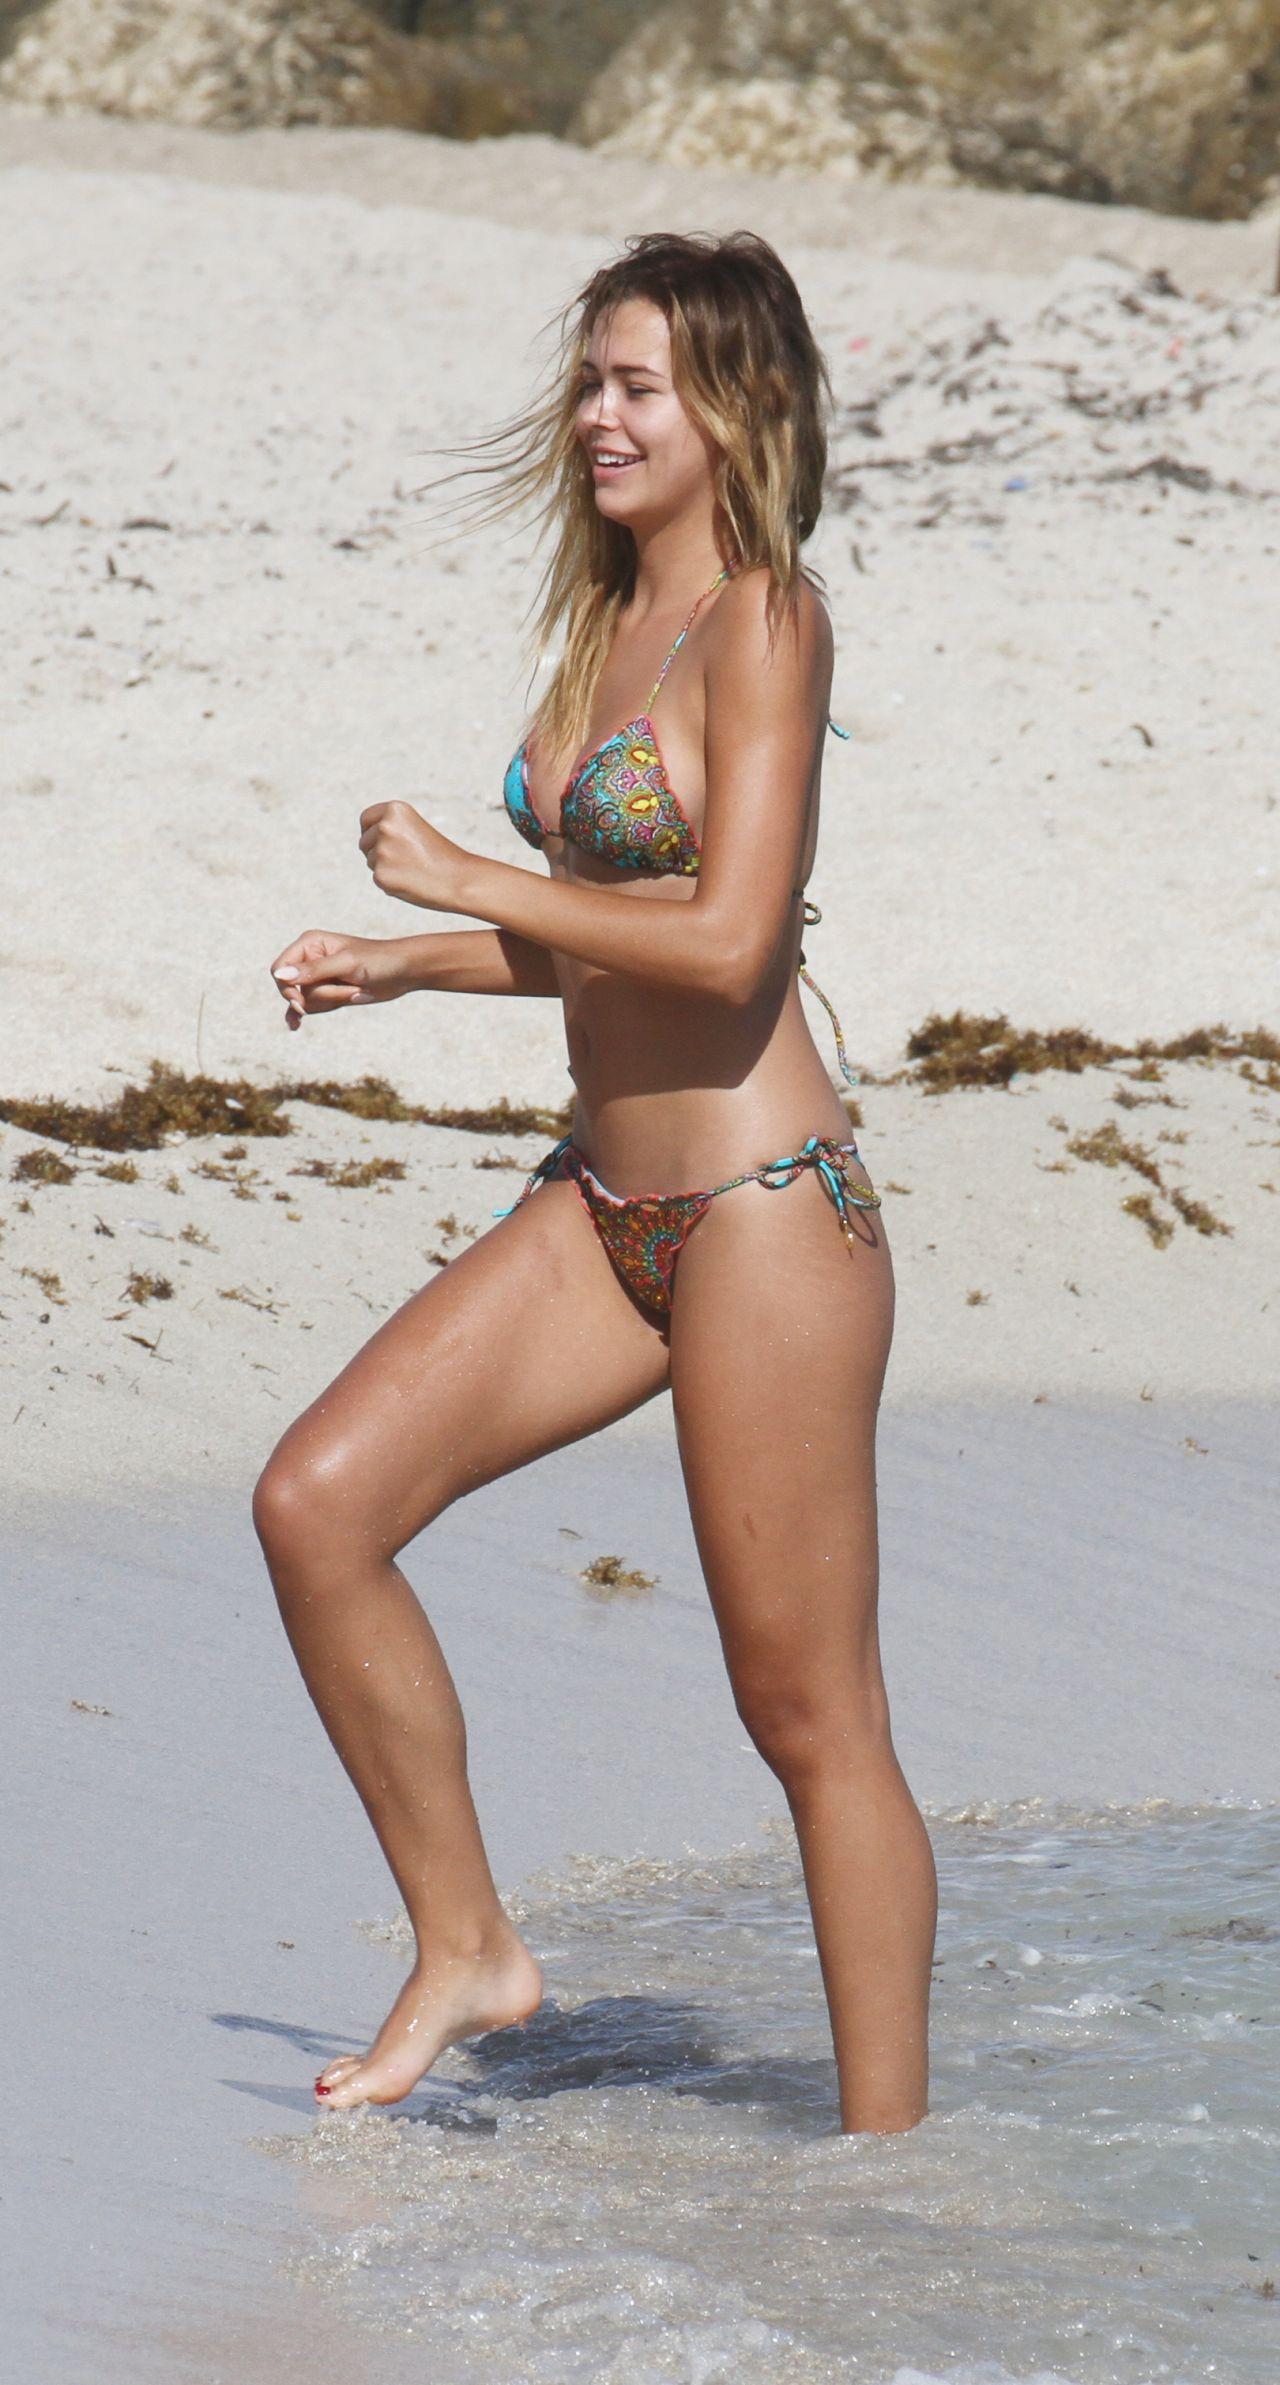 Sandra Kubicka Bikini Pics - Miami Beach, November 2015-3204